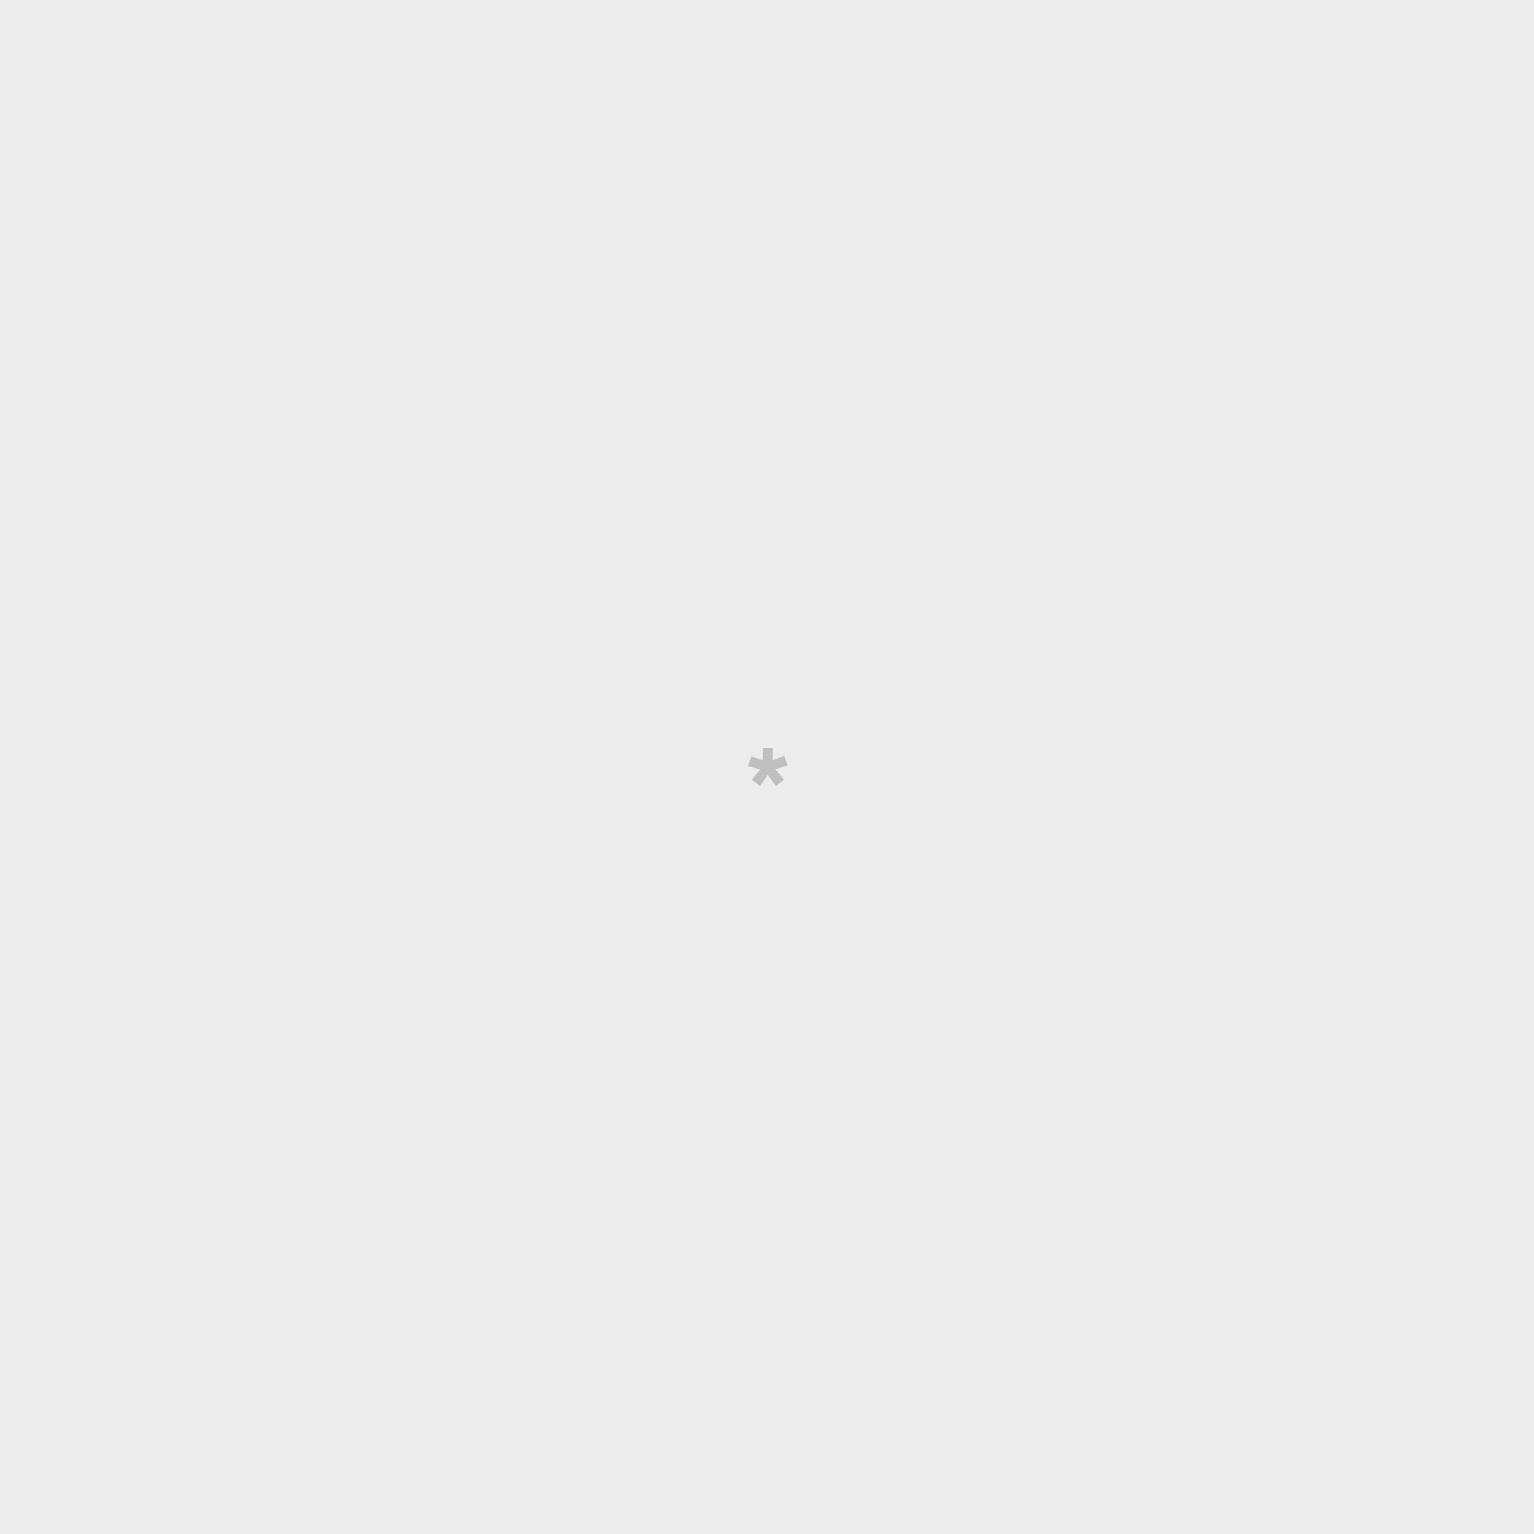 Mug - Mum, you are the best